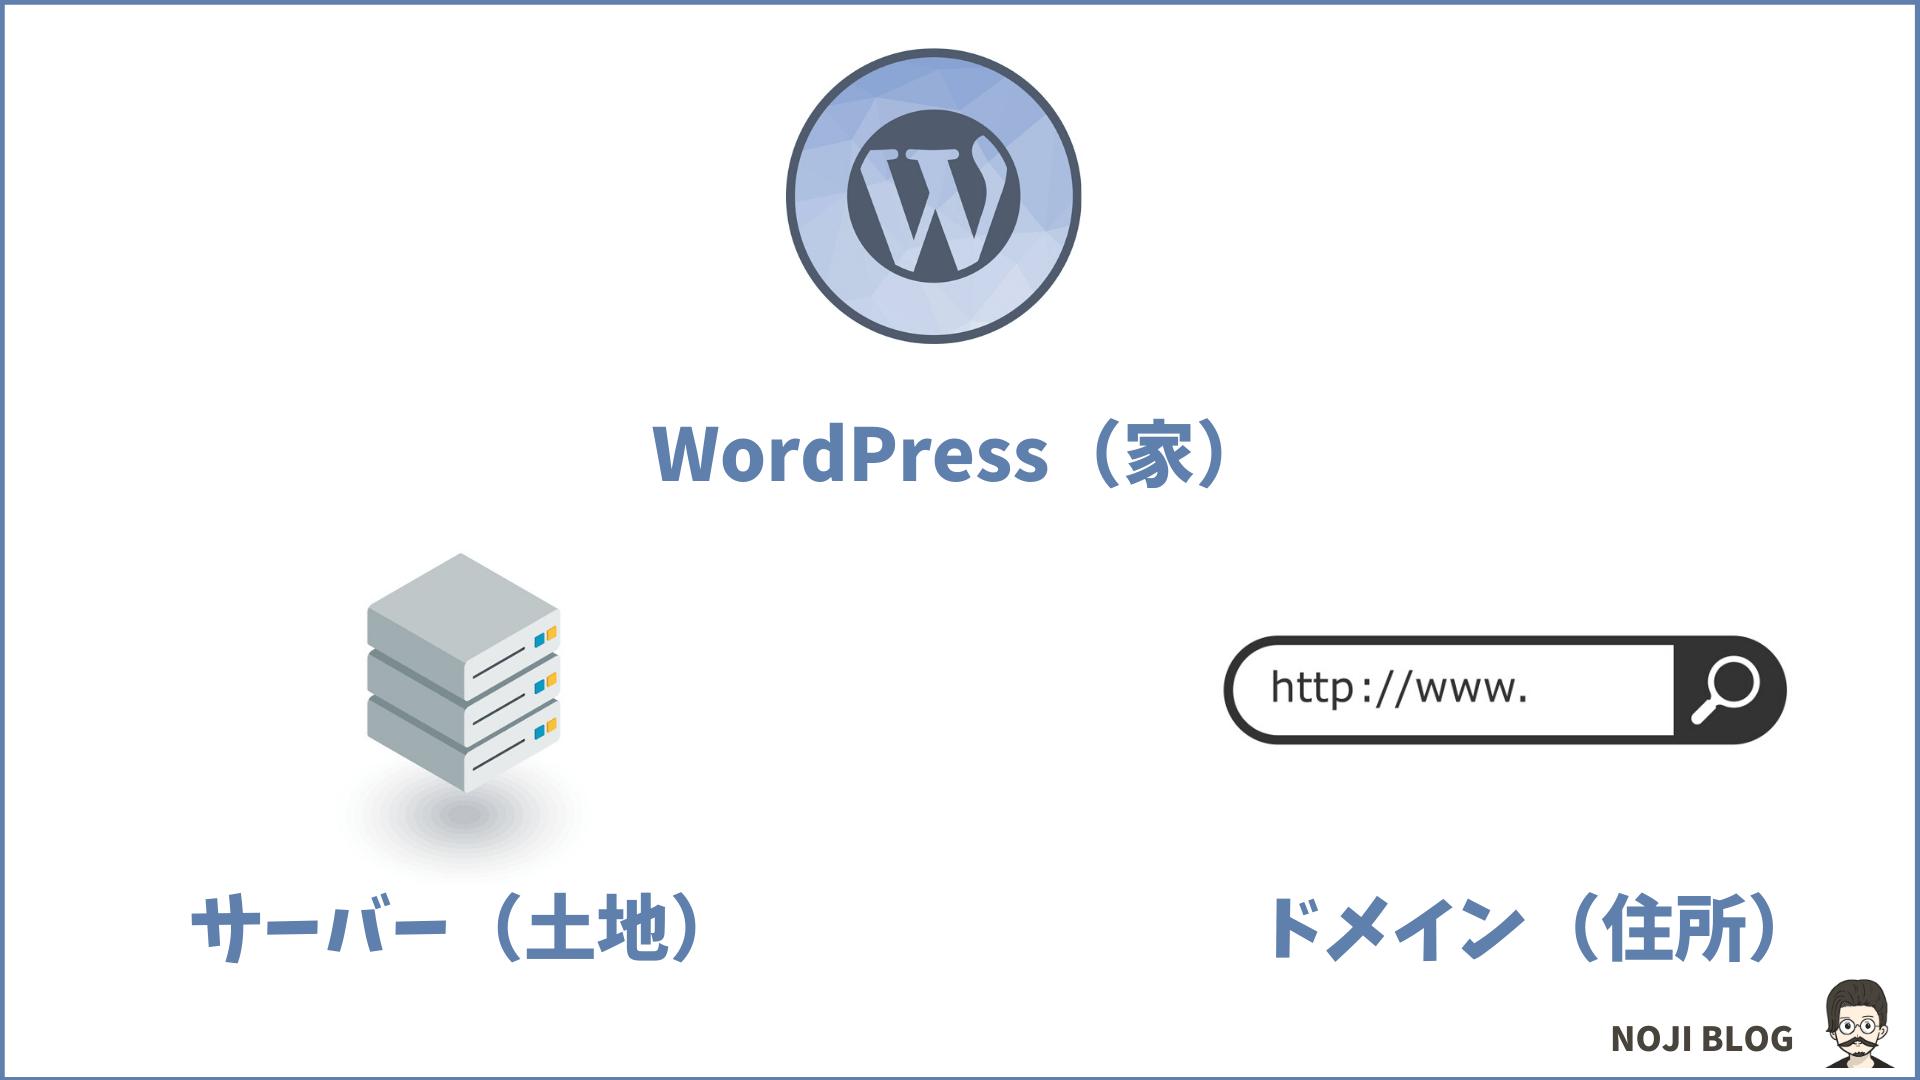 WordPressブログに必要な要素